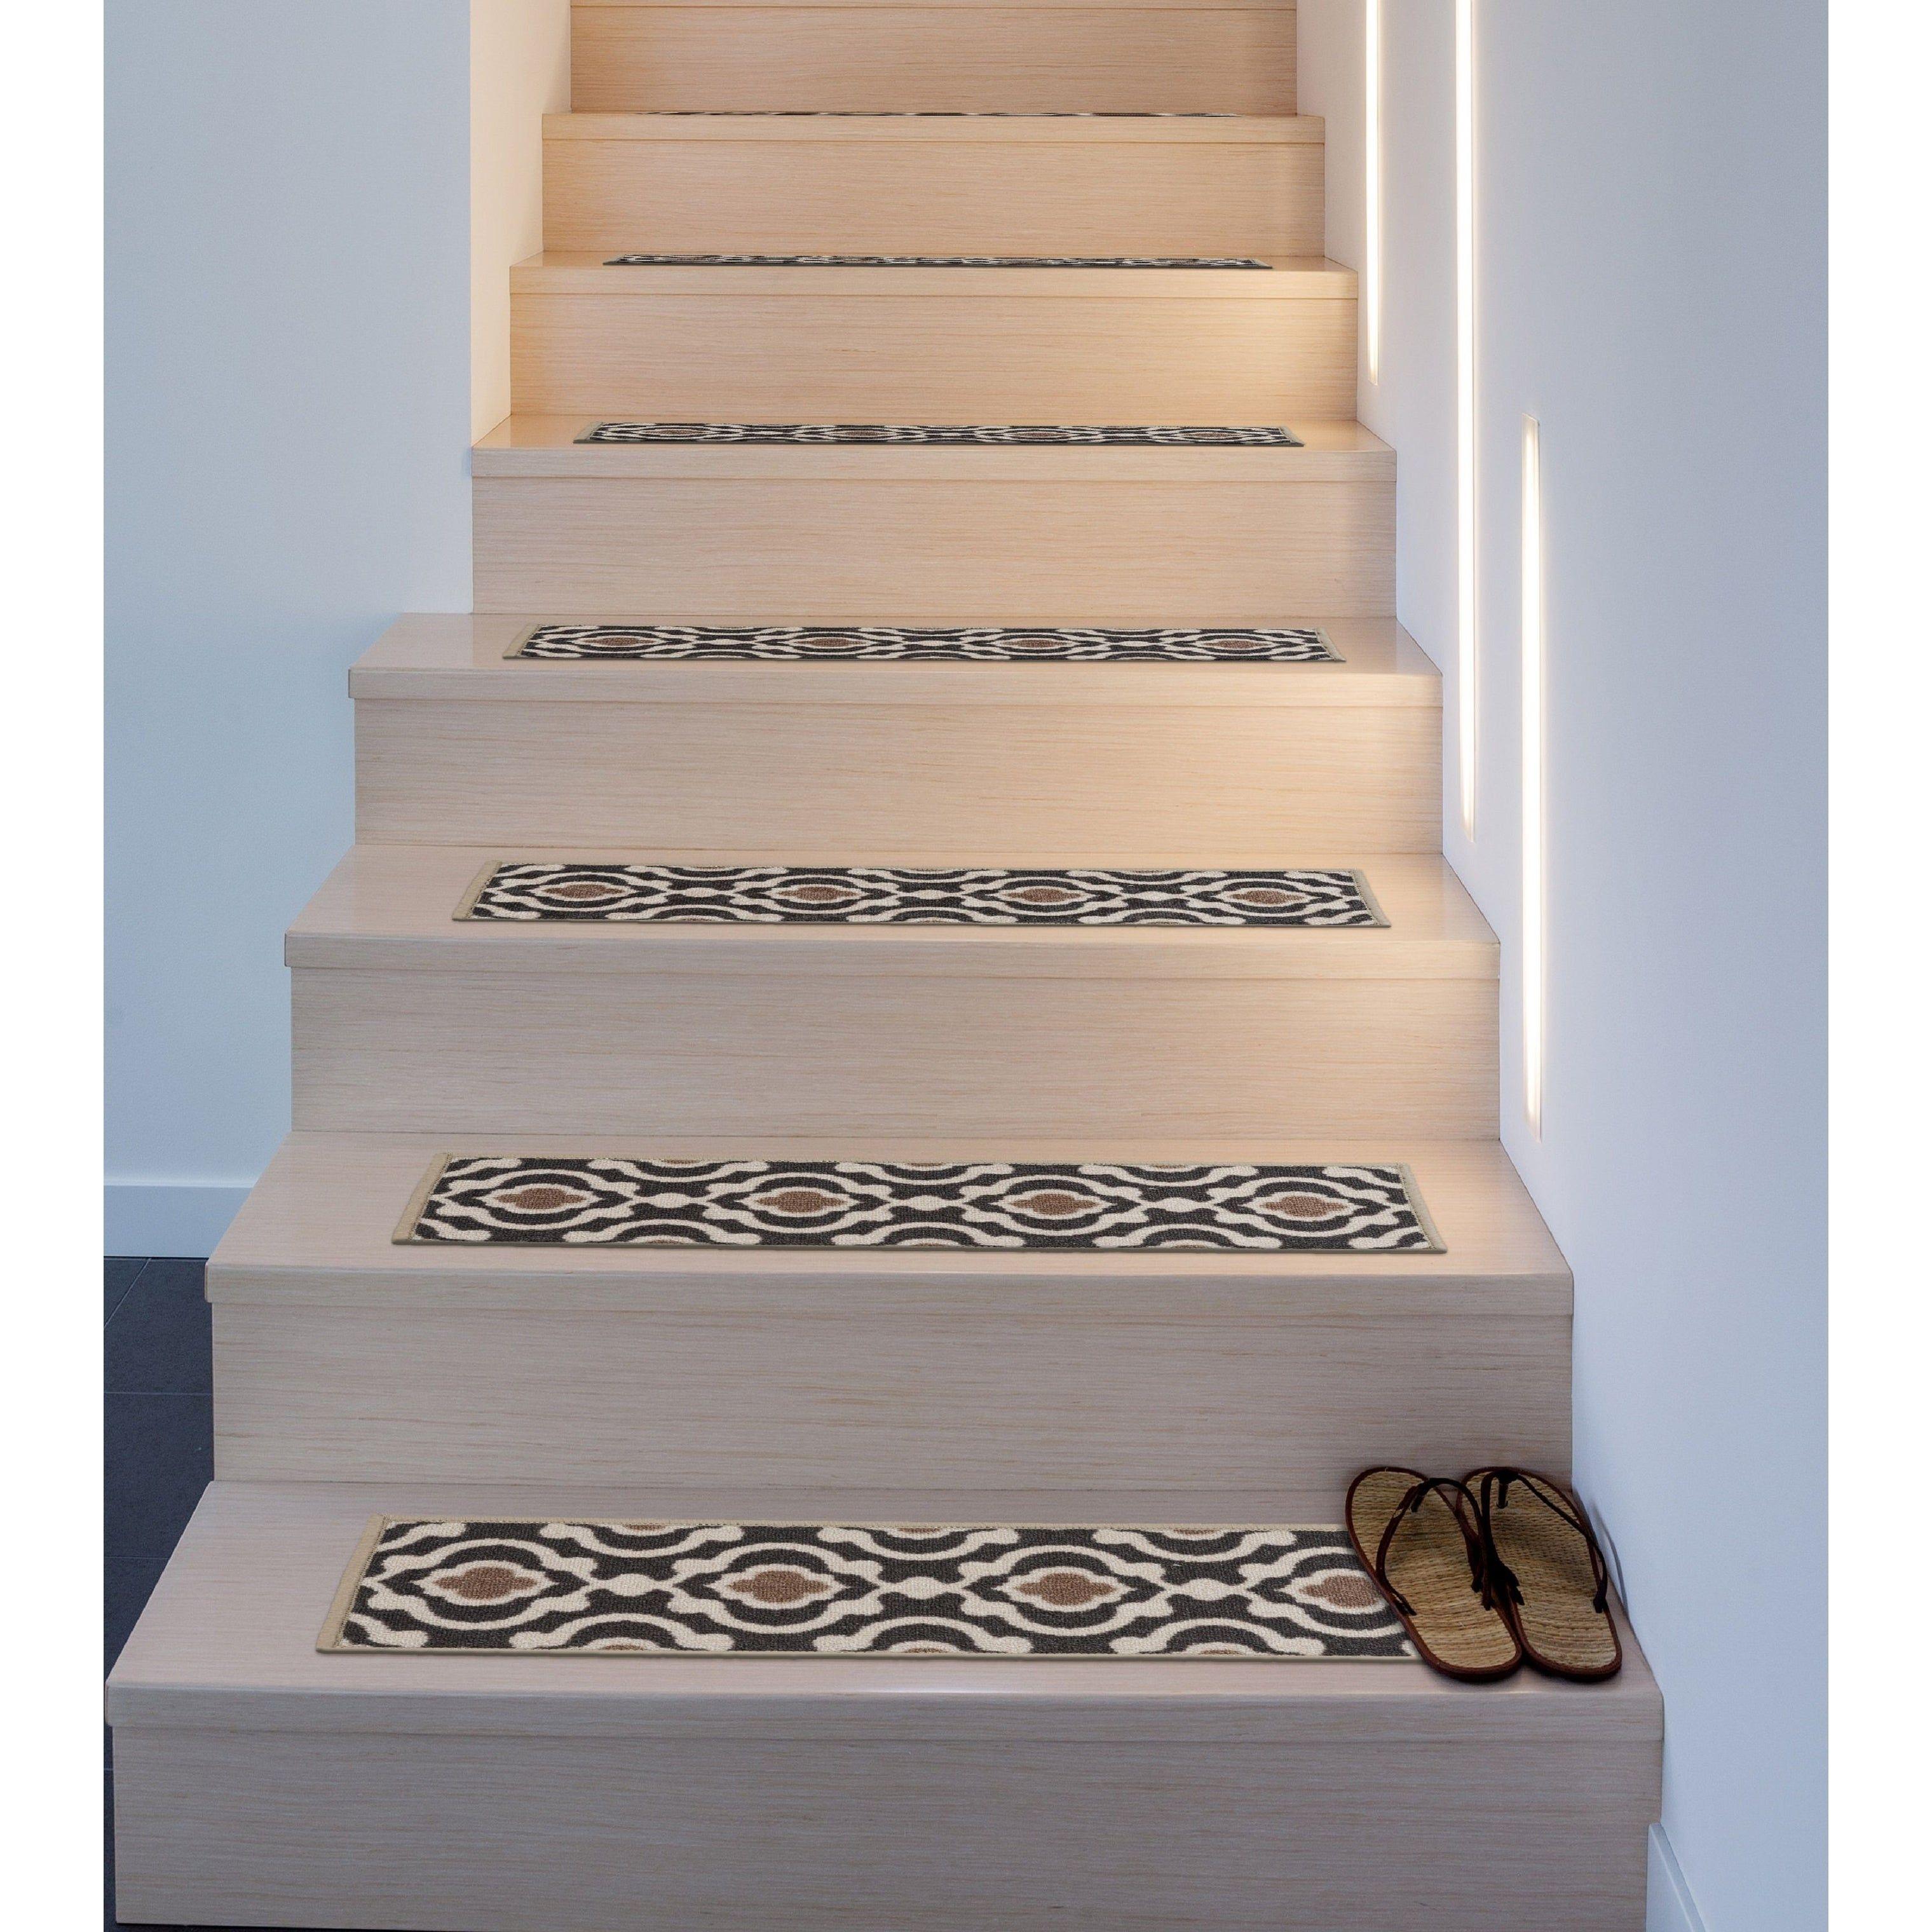 Modern Moroccan Trellis Non Slip Stair Treads 8 6 X 26 Set Of | Rug Stair Treads Non Slip | Bullnose Carpet | Gloria Rug | Slip Resistant | Tread Covers | Flooring